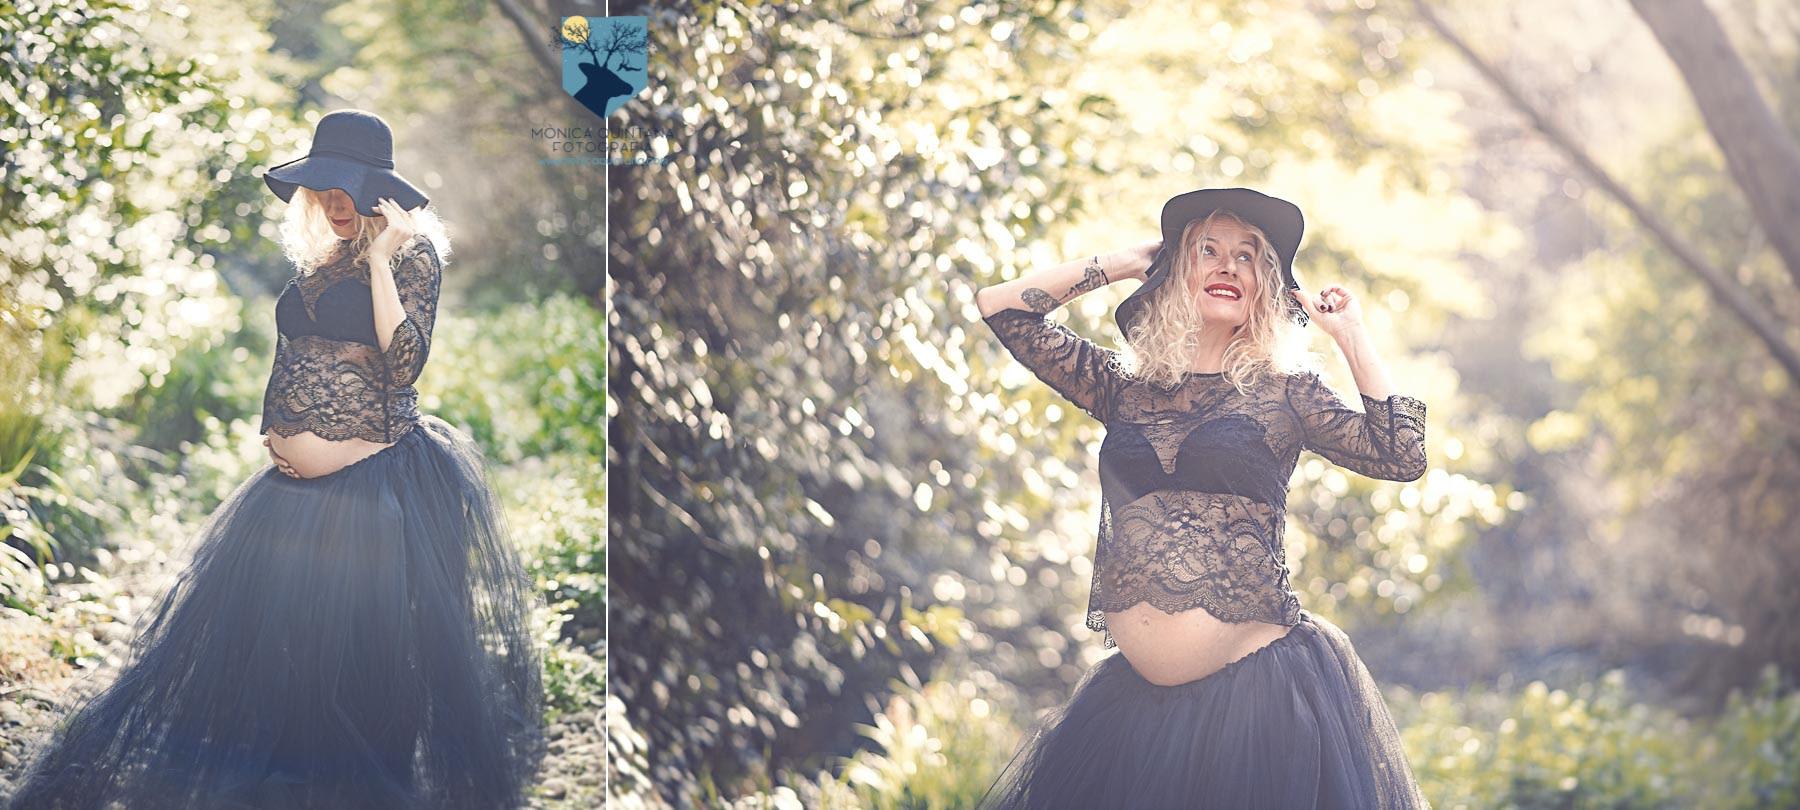 fotografia girona figueres emporda monica quintana familia retrato embarazo embarazada pareja amor naturaleza embaras natura parella fotos